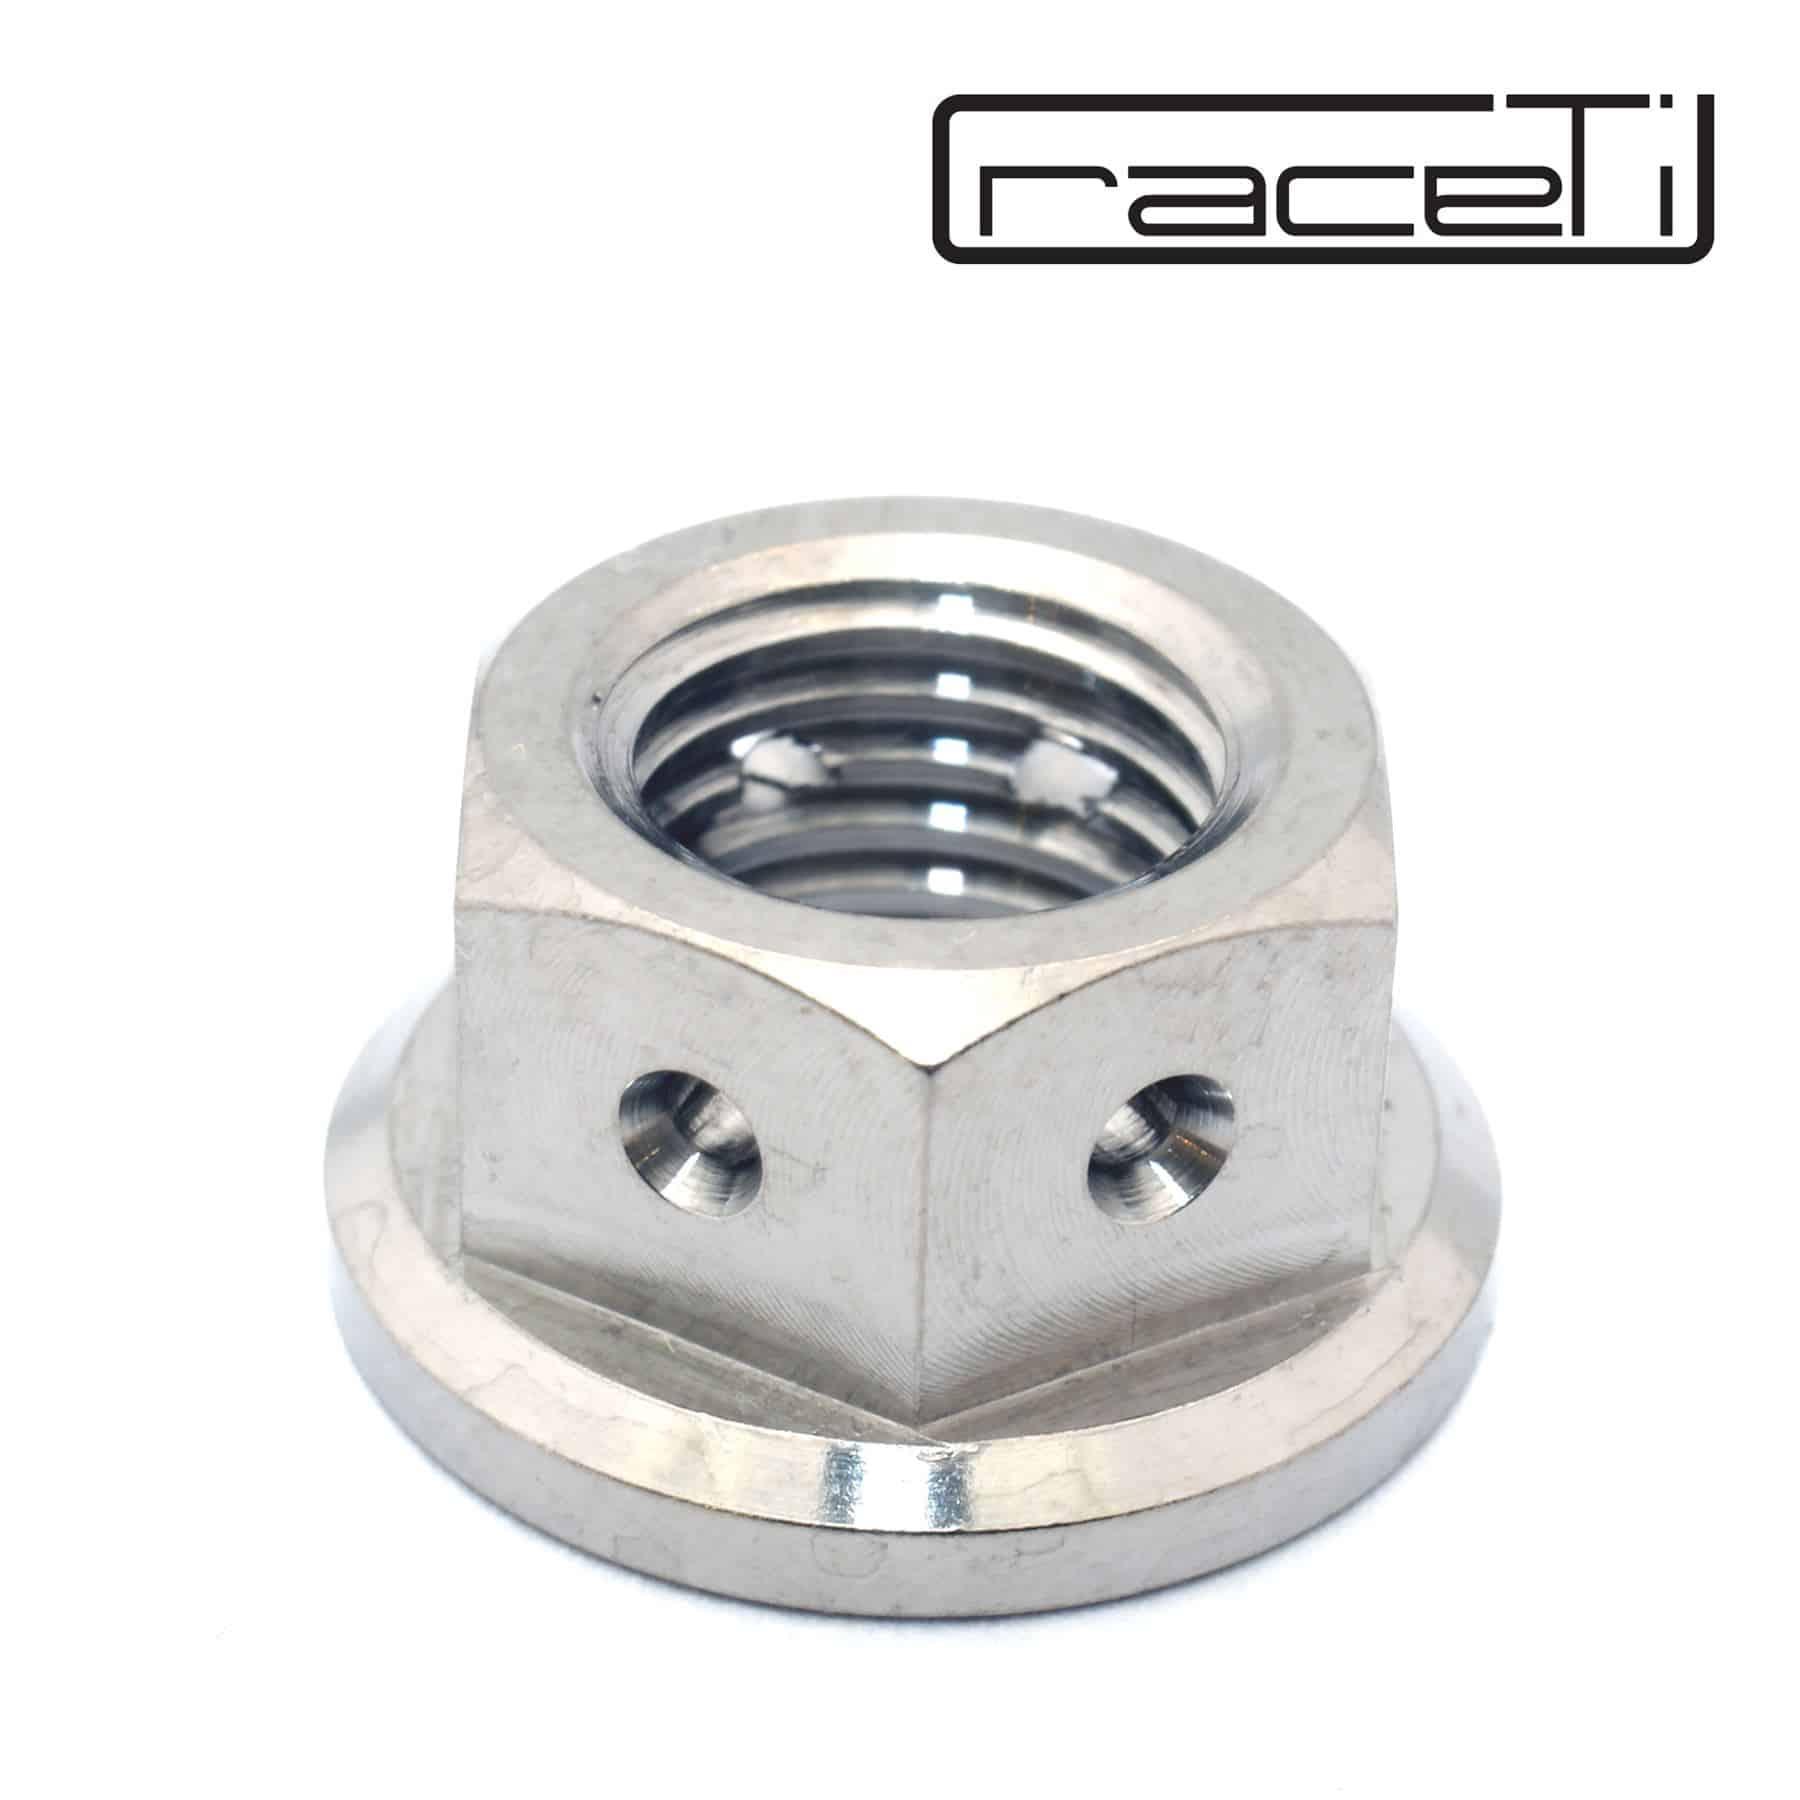 2PC Titanium Flange M10 Lock Nut 1.25mm pitch Nylon Lock Nut Hex nut